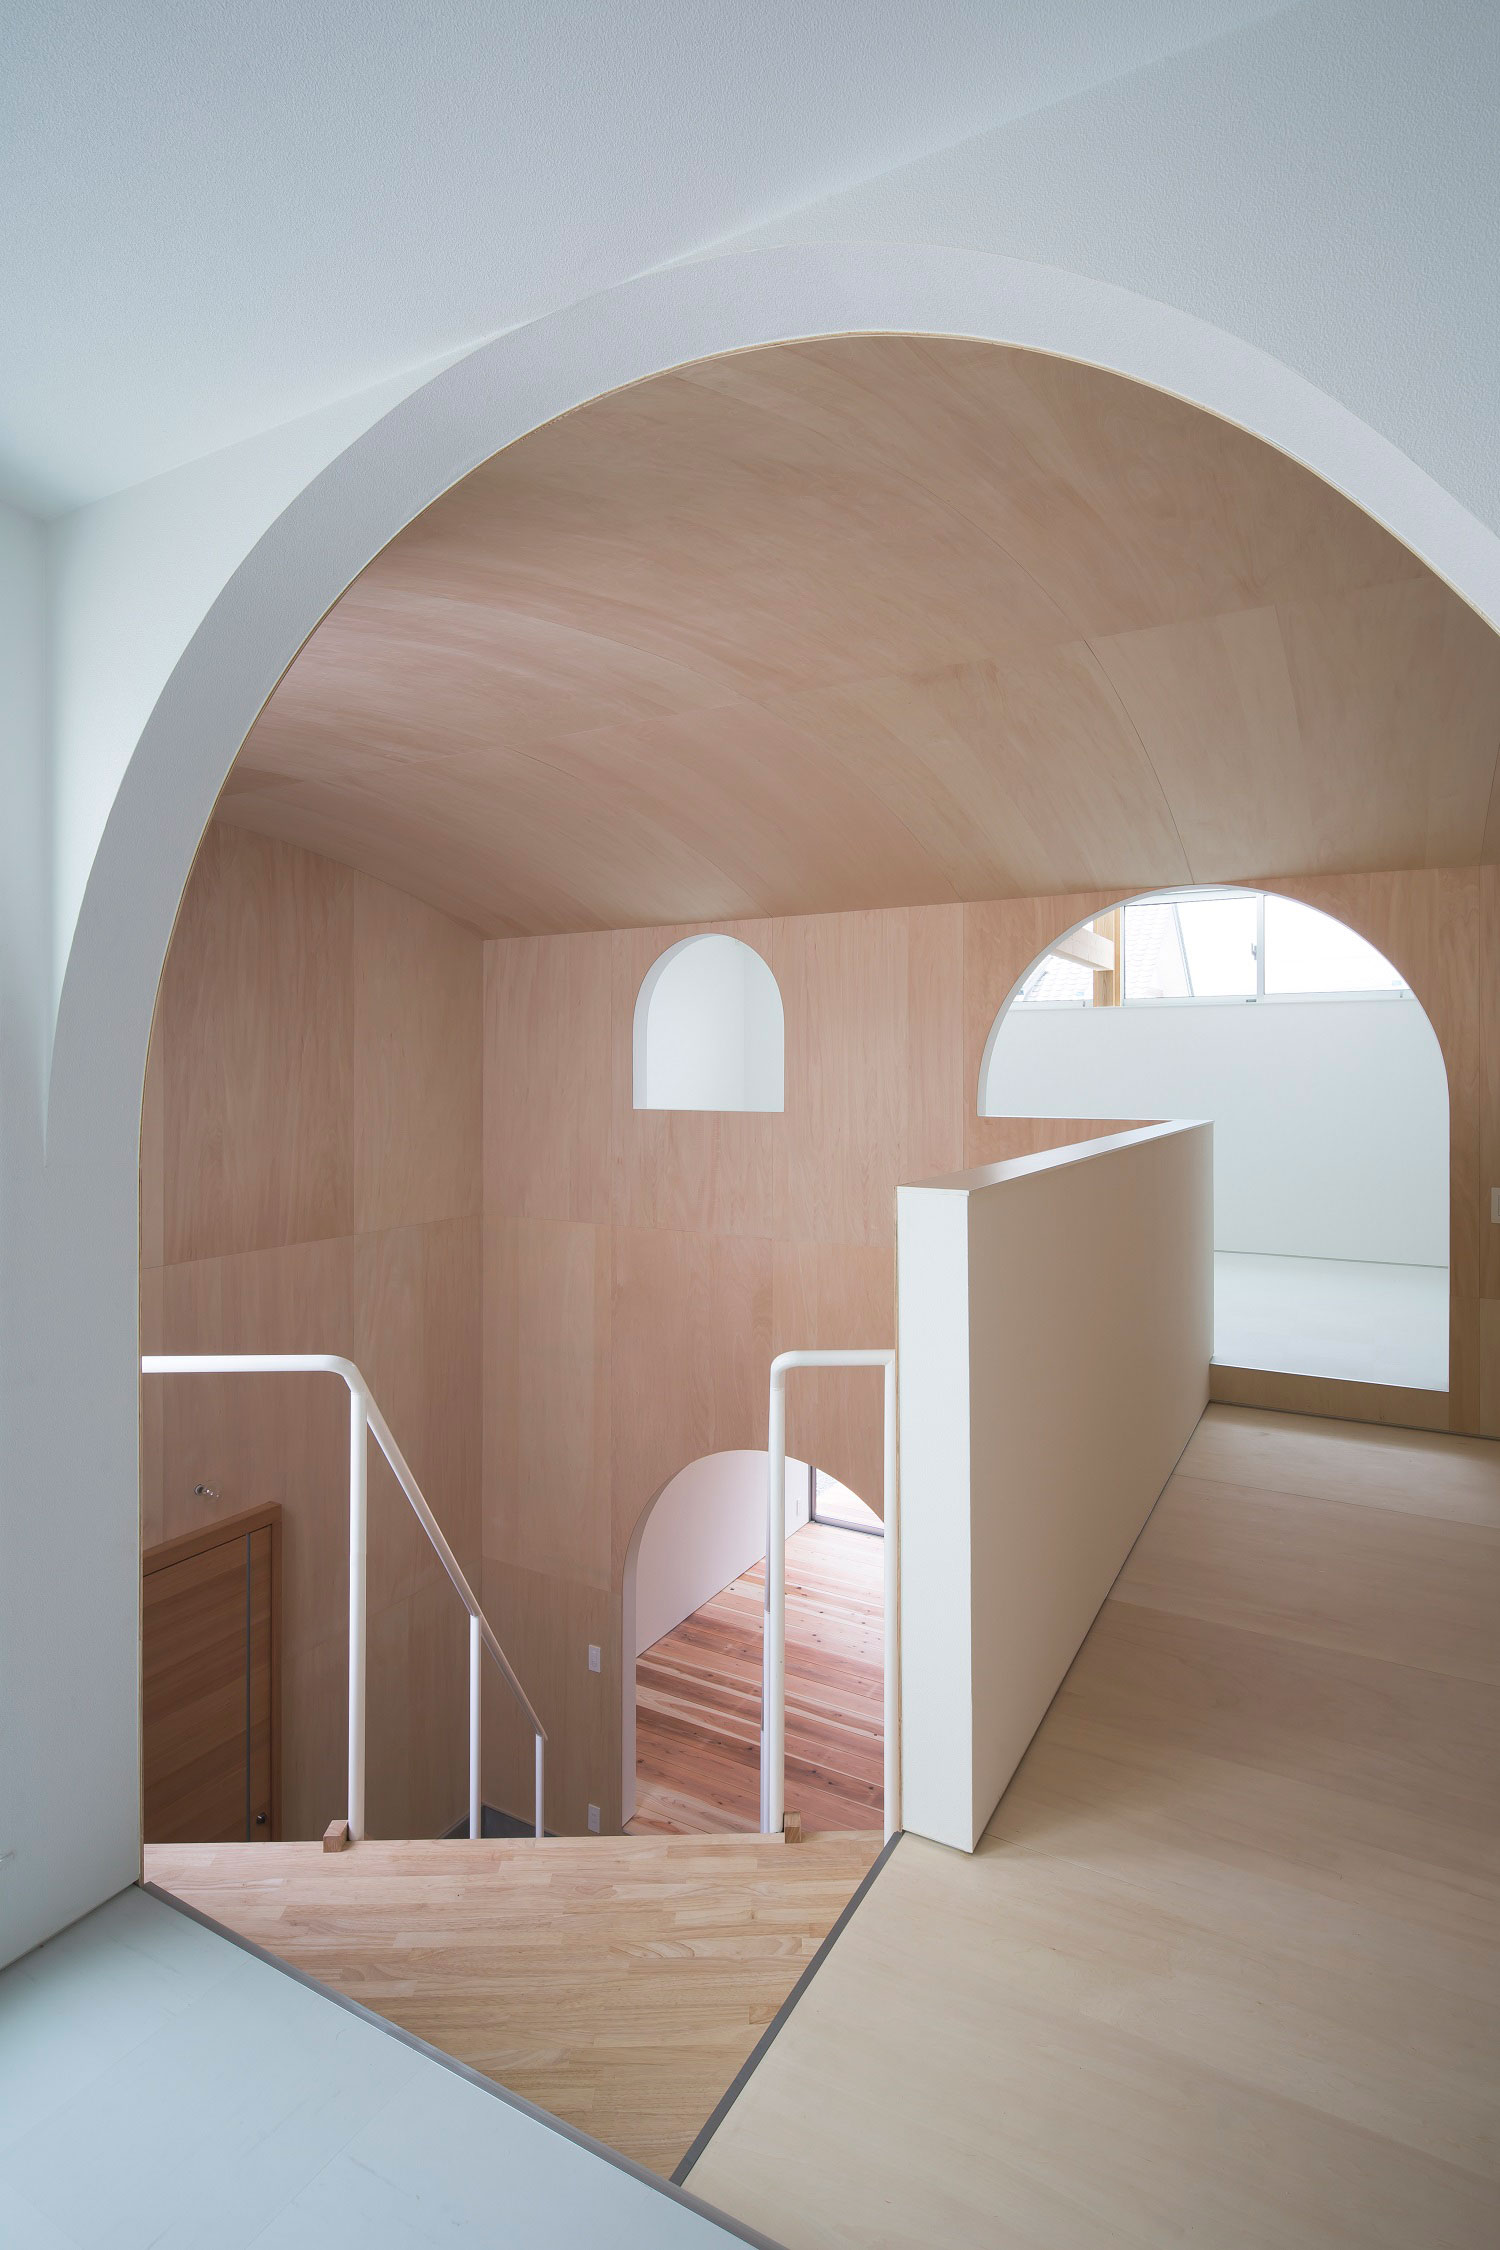 Дизайн арки межкомнатной